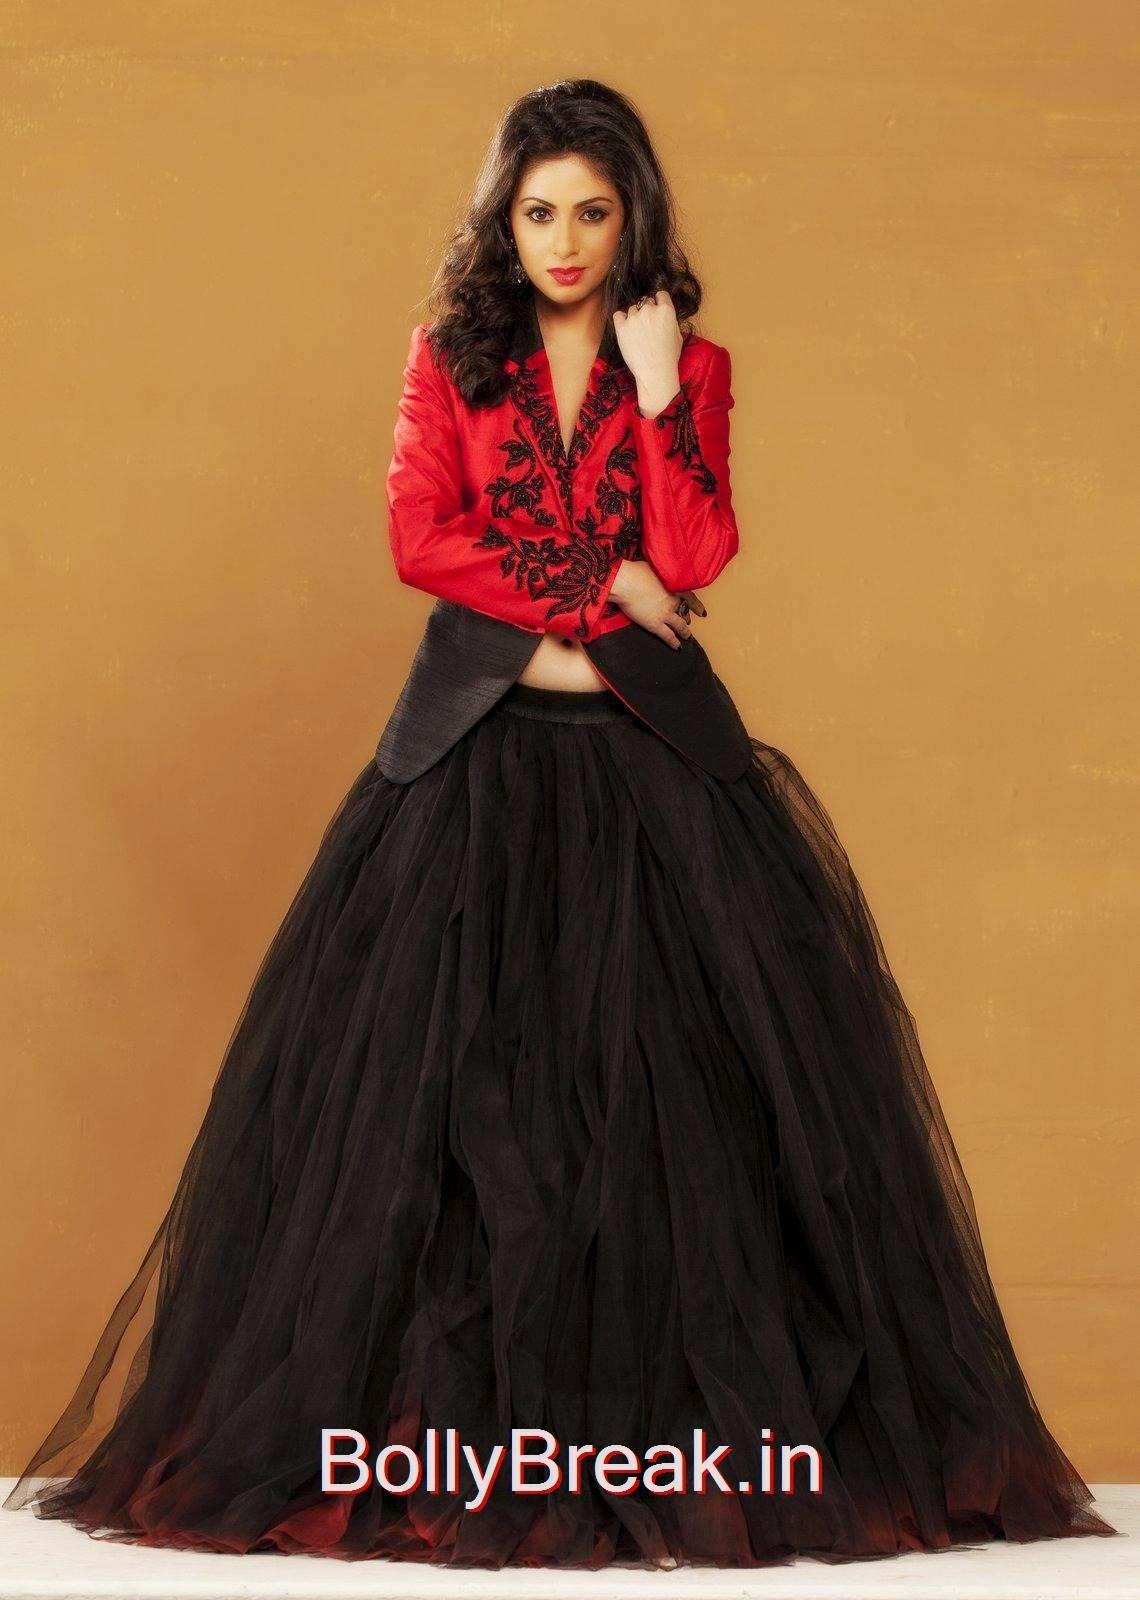 Sada Photoshoot Stills, Hot HD Images Of Sada In Red & Black Dress